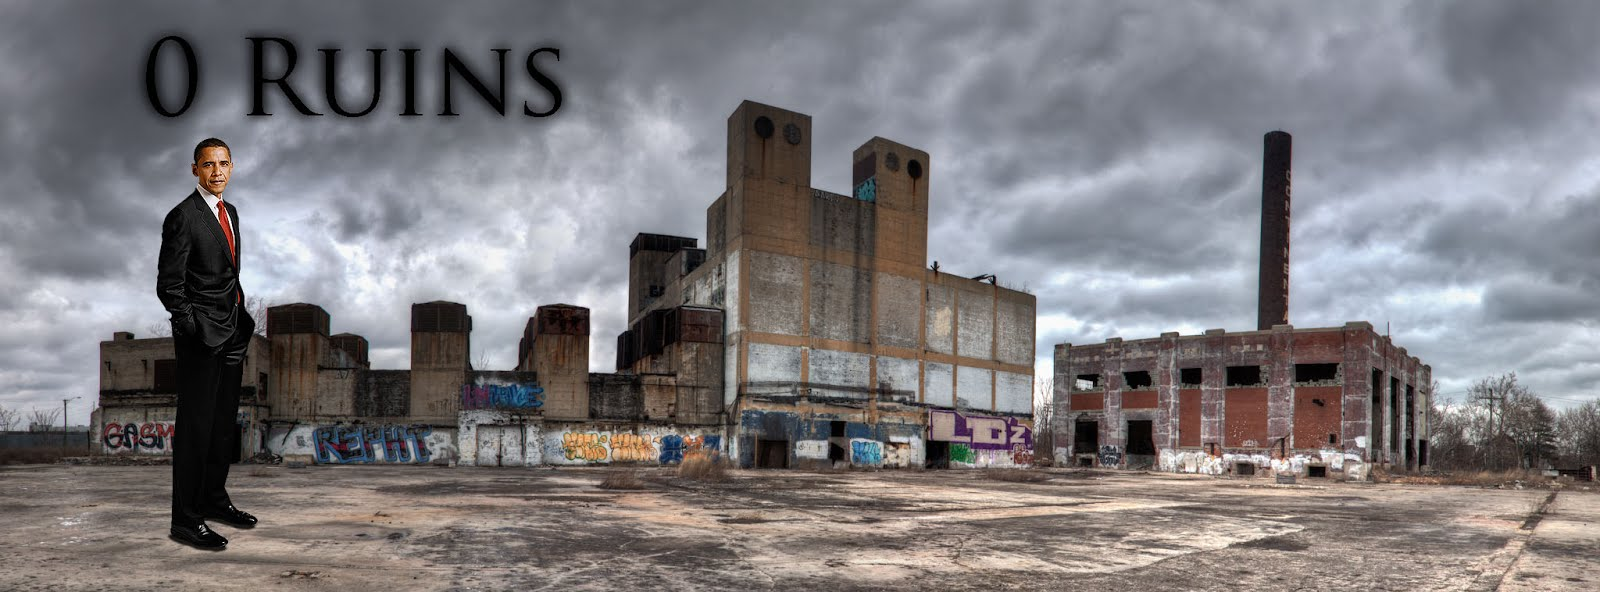 0 Ruins